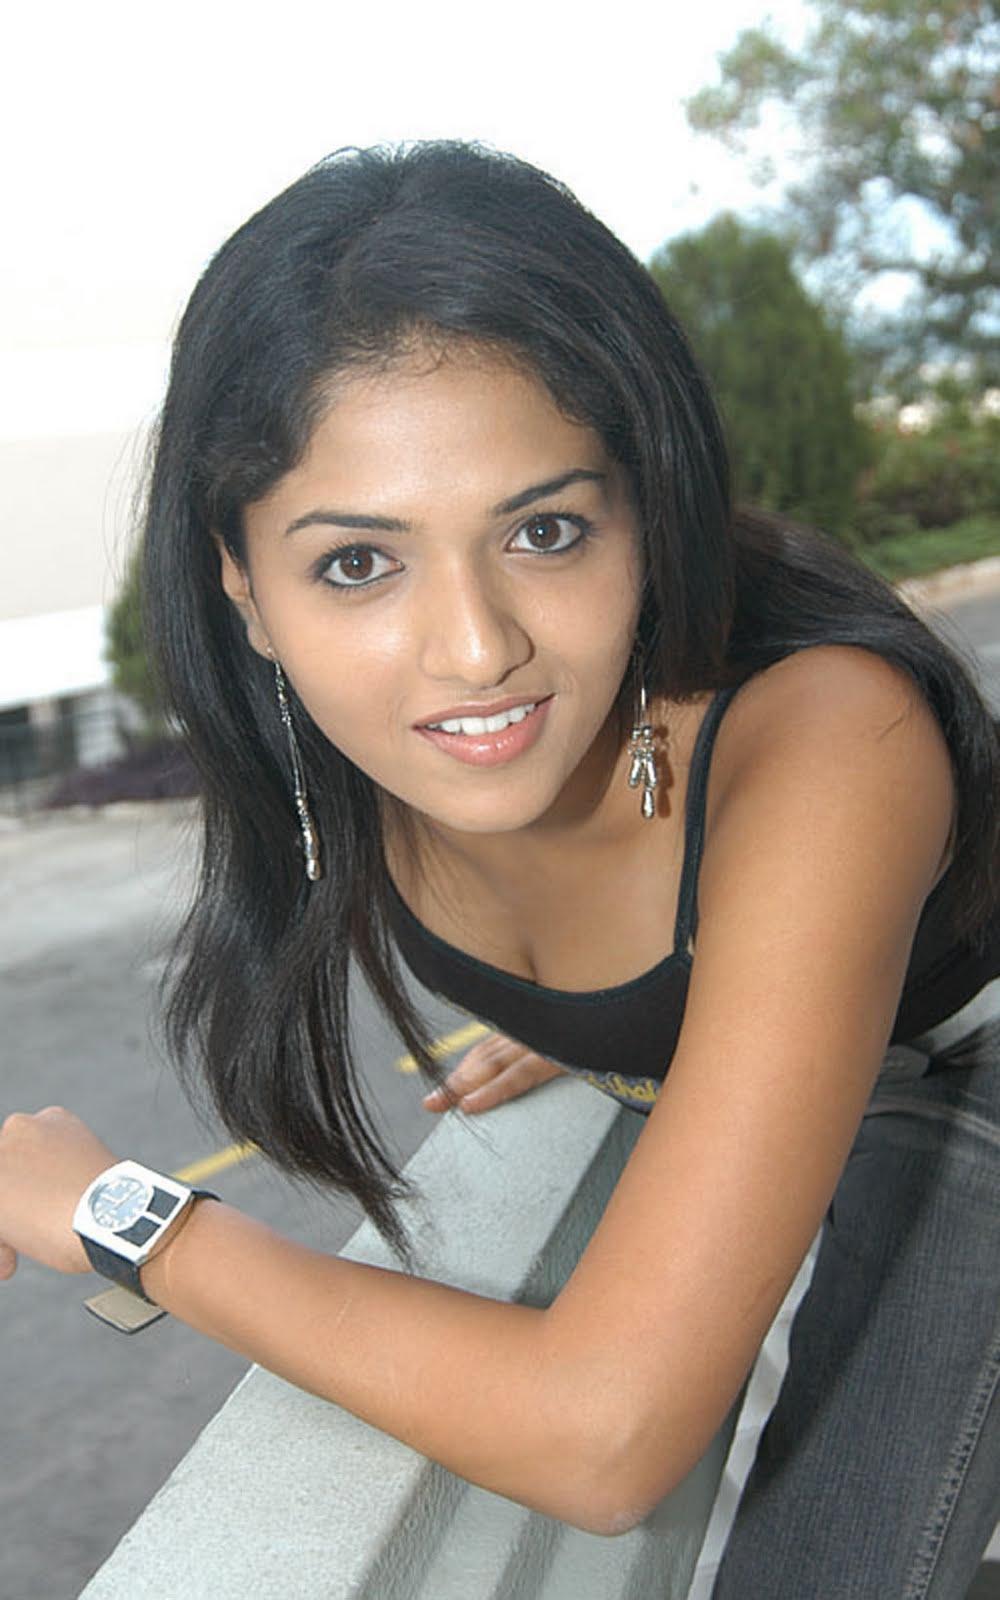 Sunaina public photos